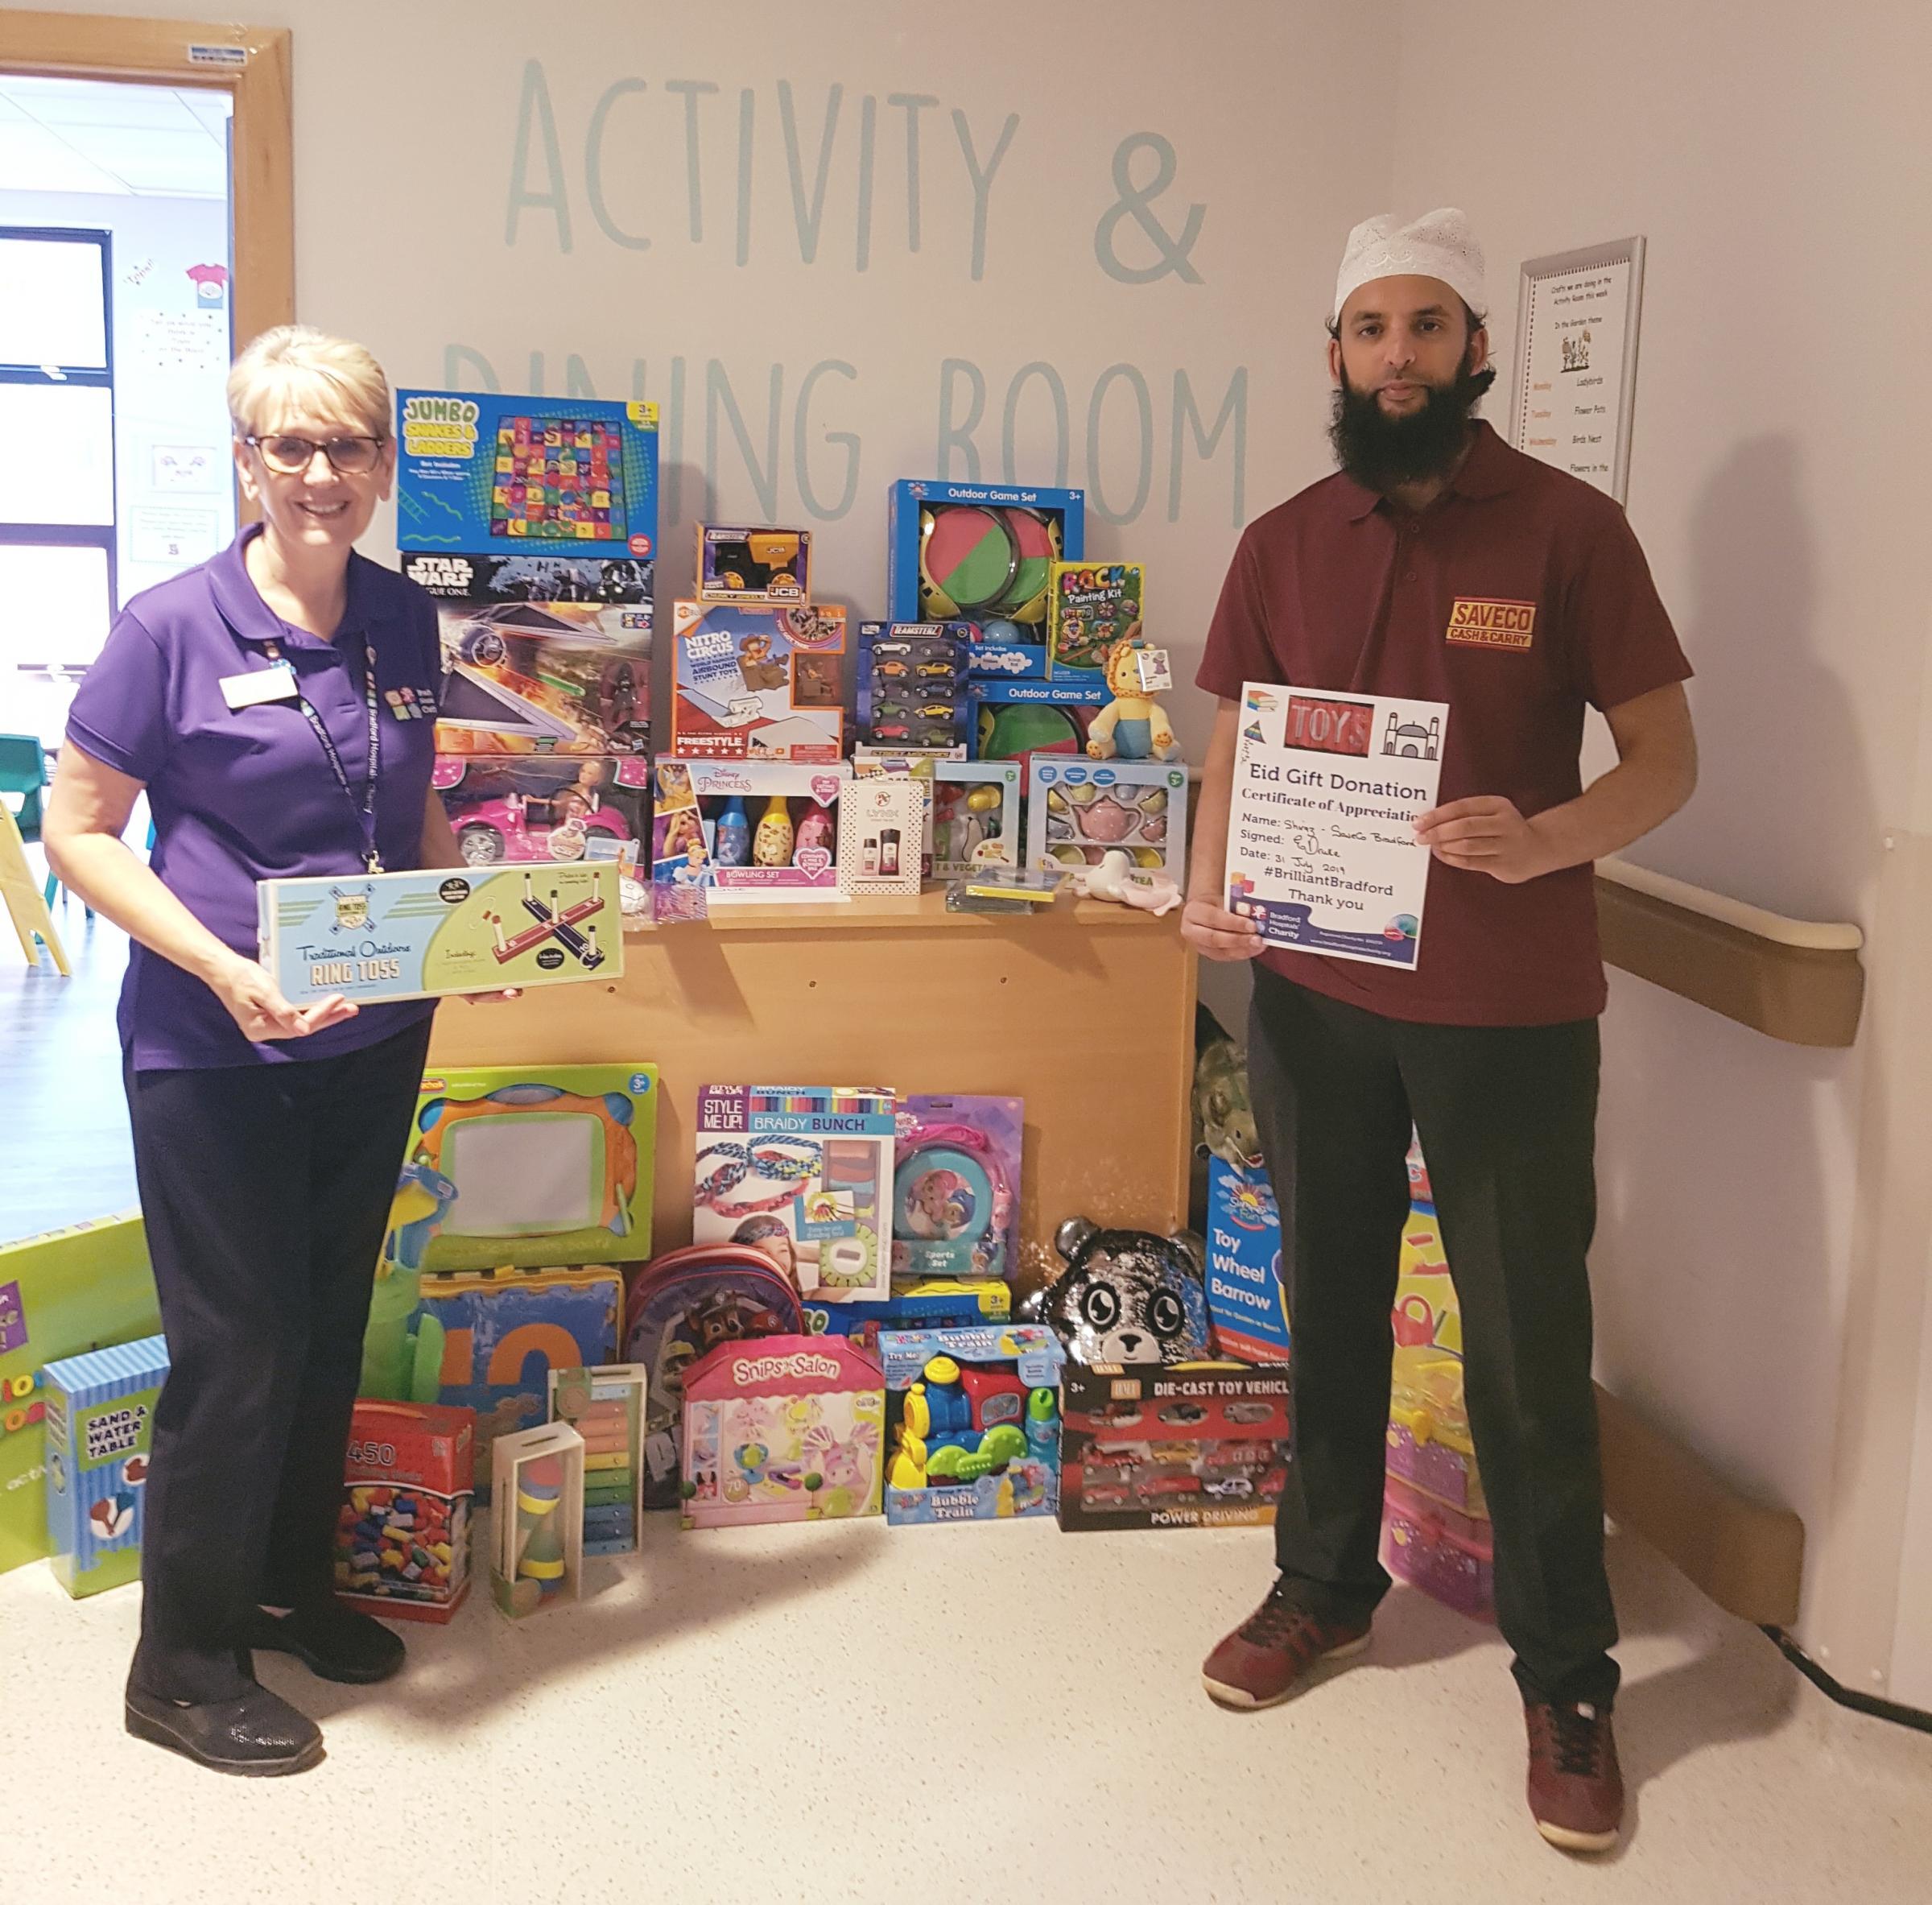 Gift donation at BRI for Eid lifts children's spirits